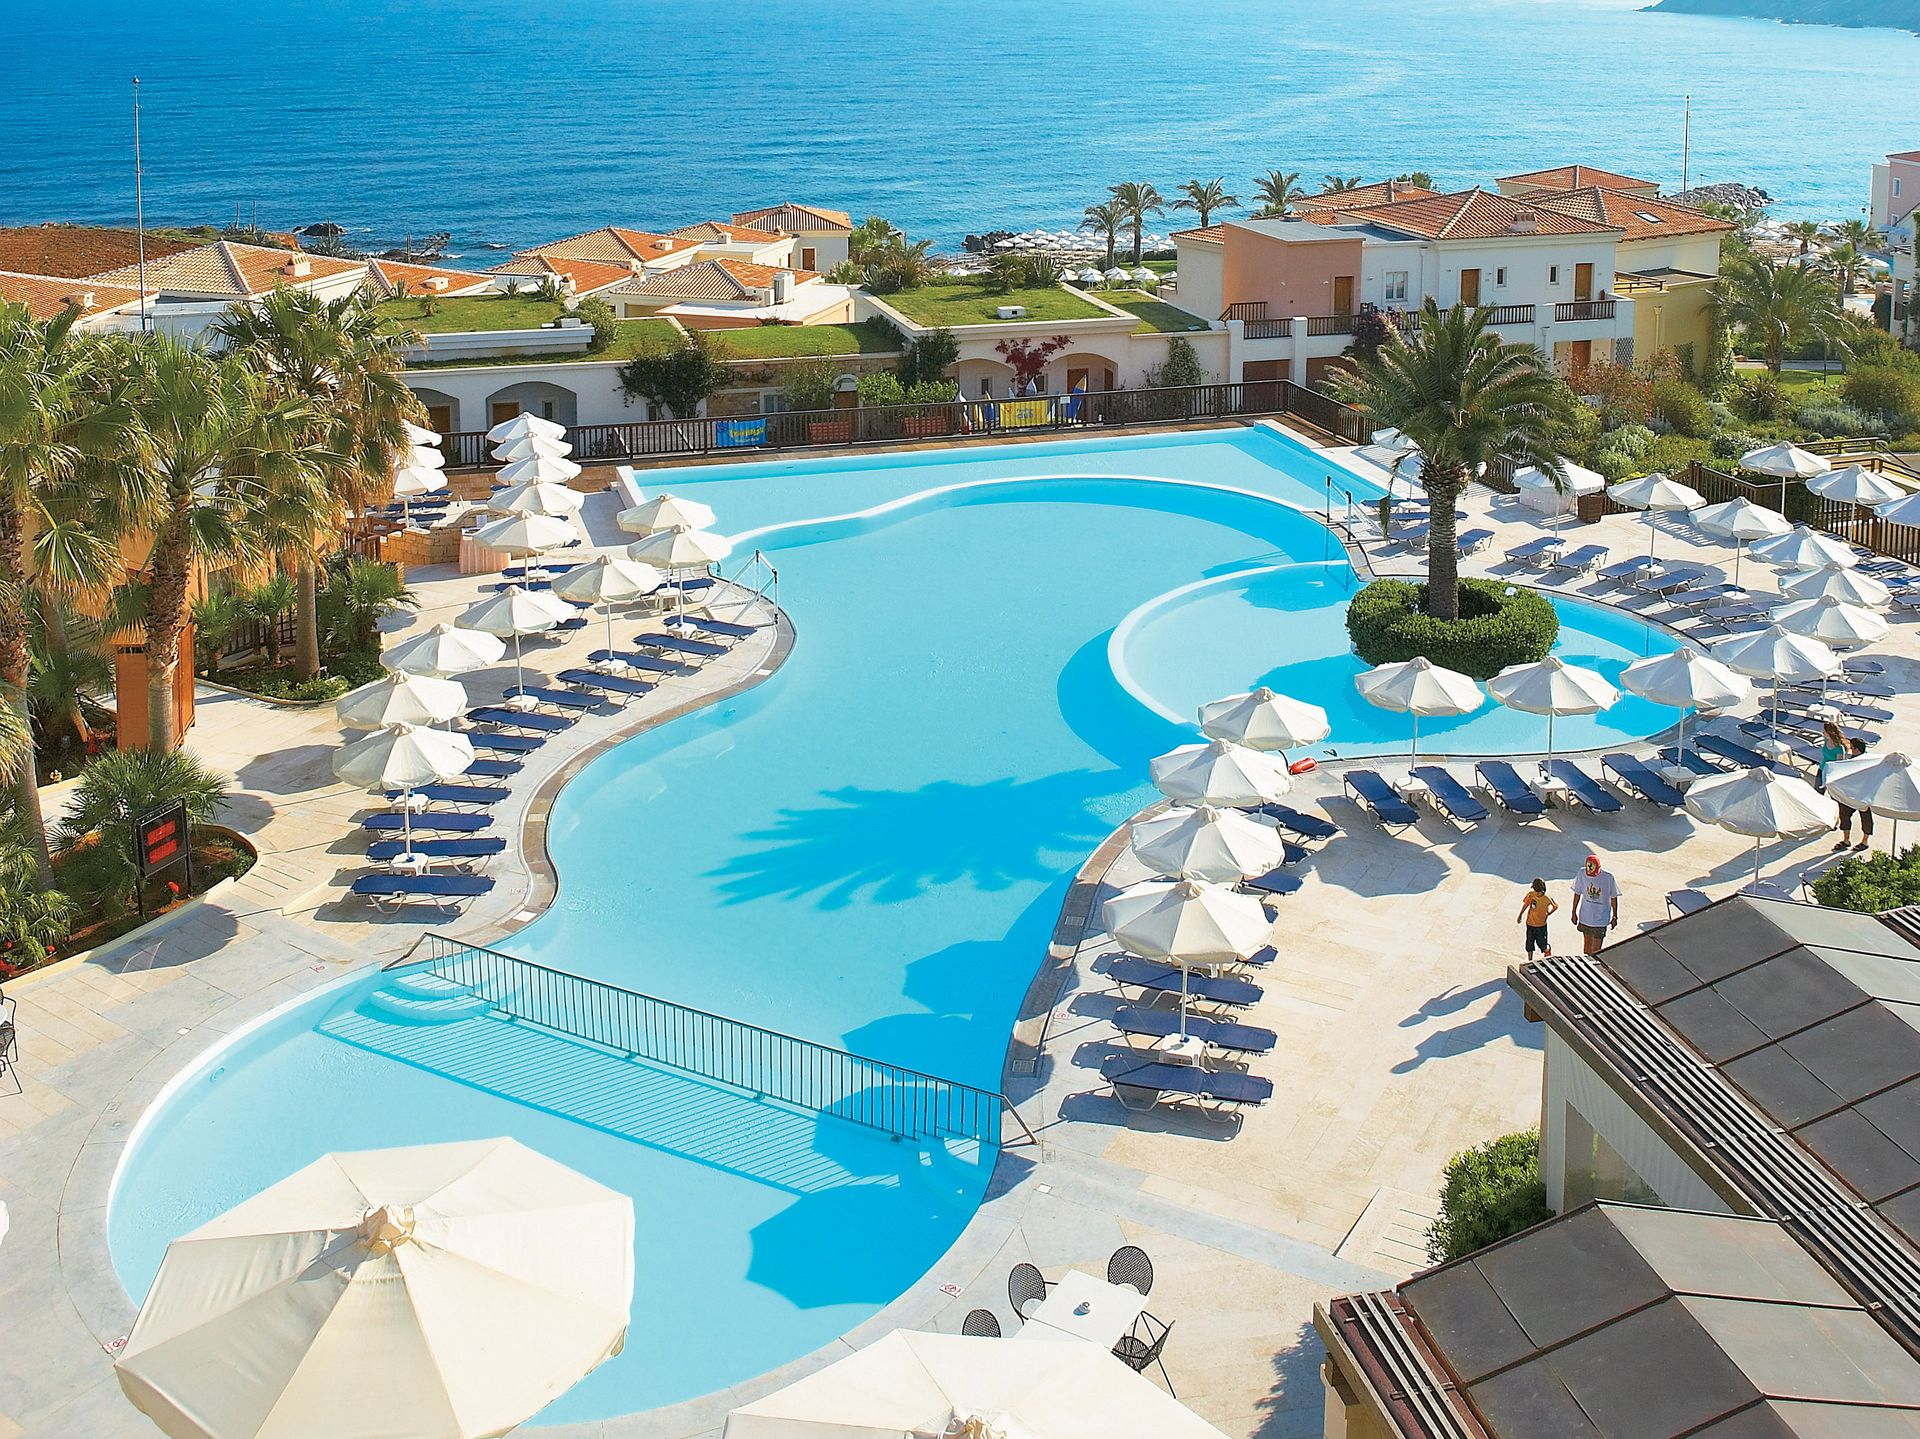 Grecotel Club Marine Palace & Marine Palace Suites, Πάνορμος, Ρέθυμνο